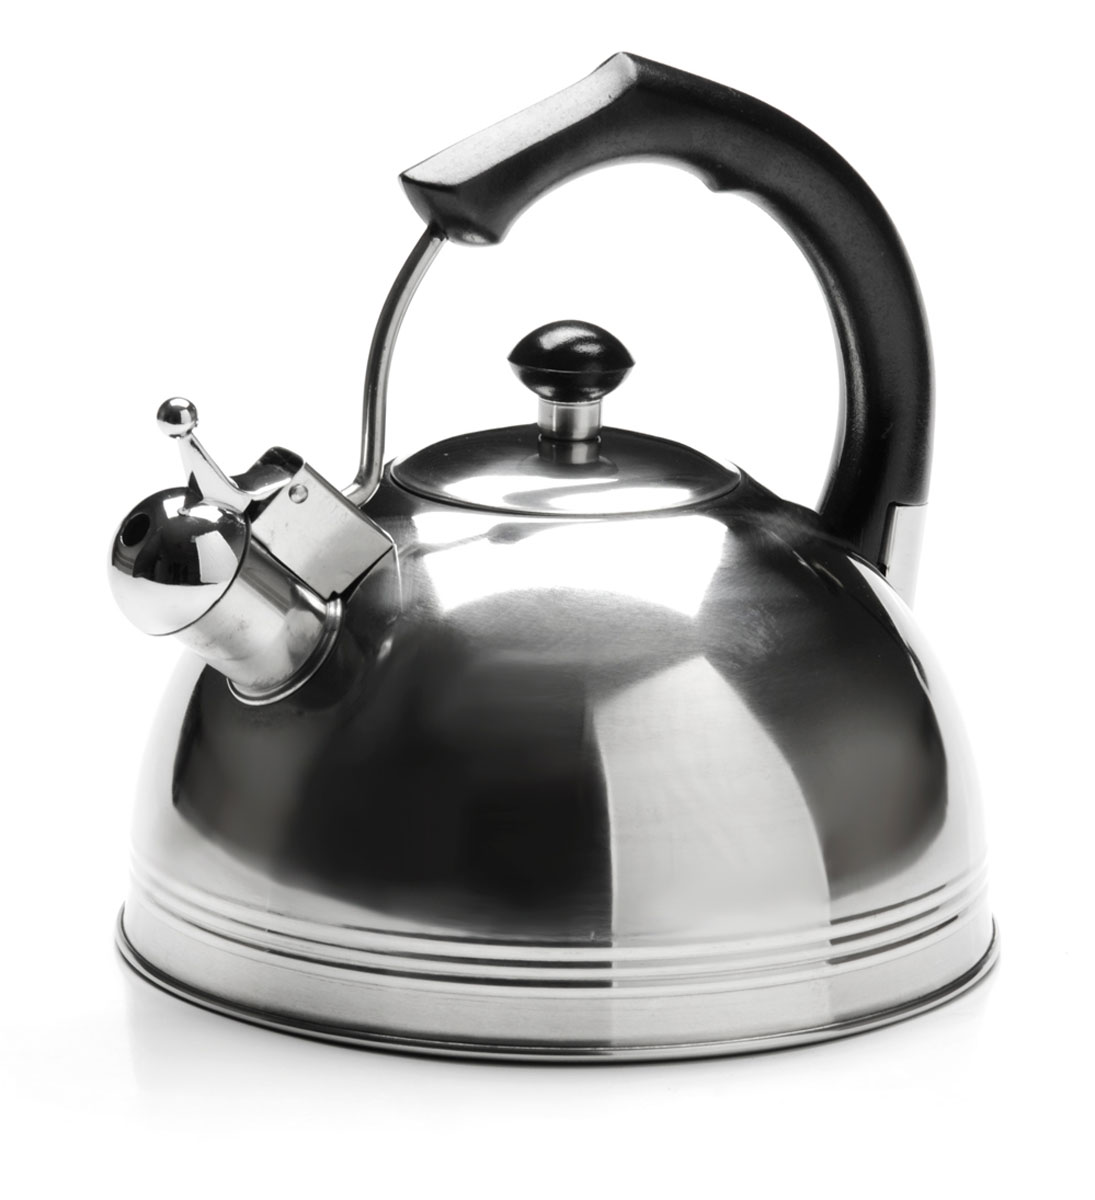 Чайник Mayer & Boch, со свистком, 3 л. 2616426164